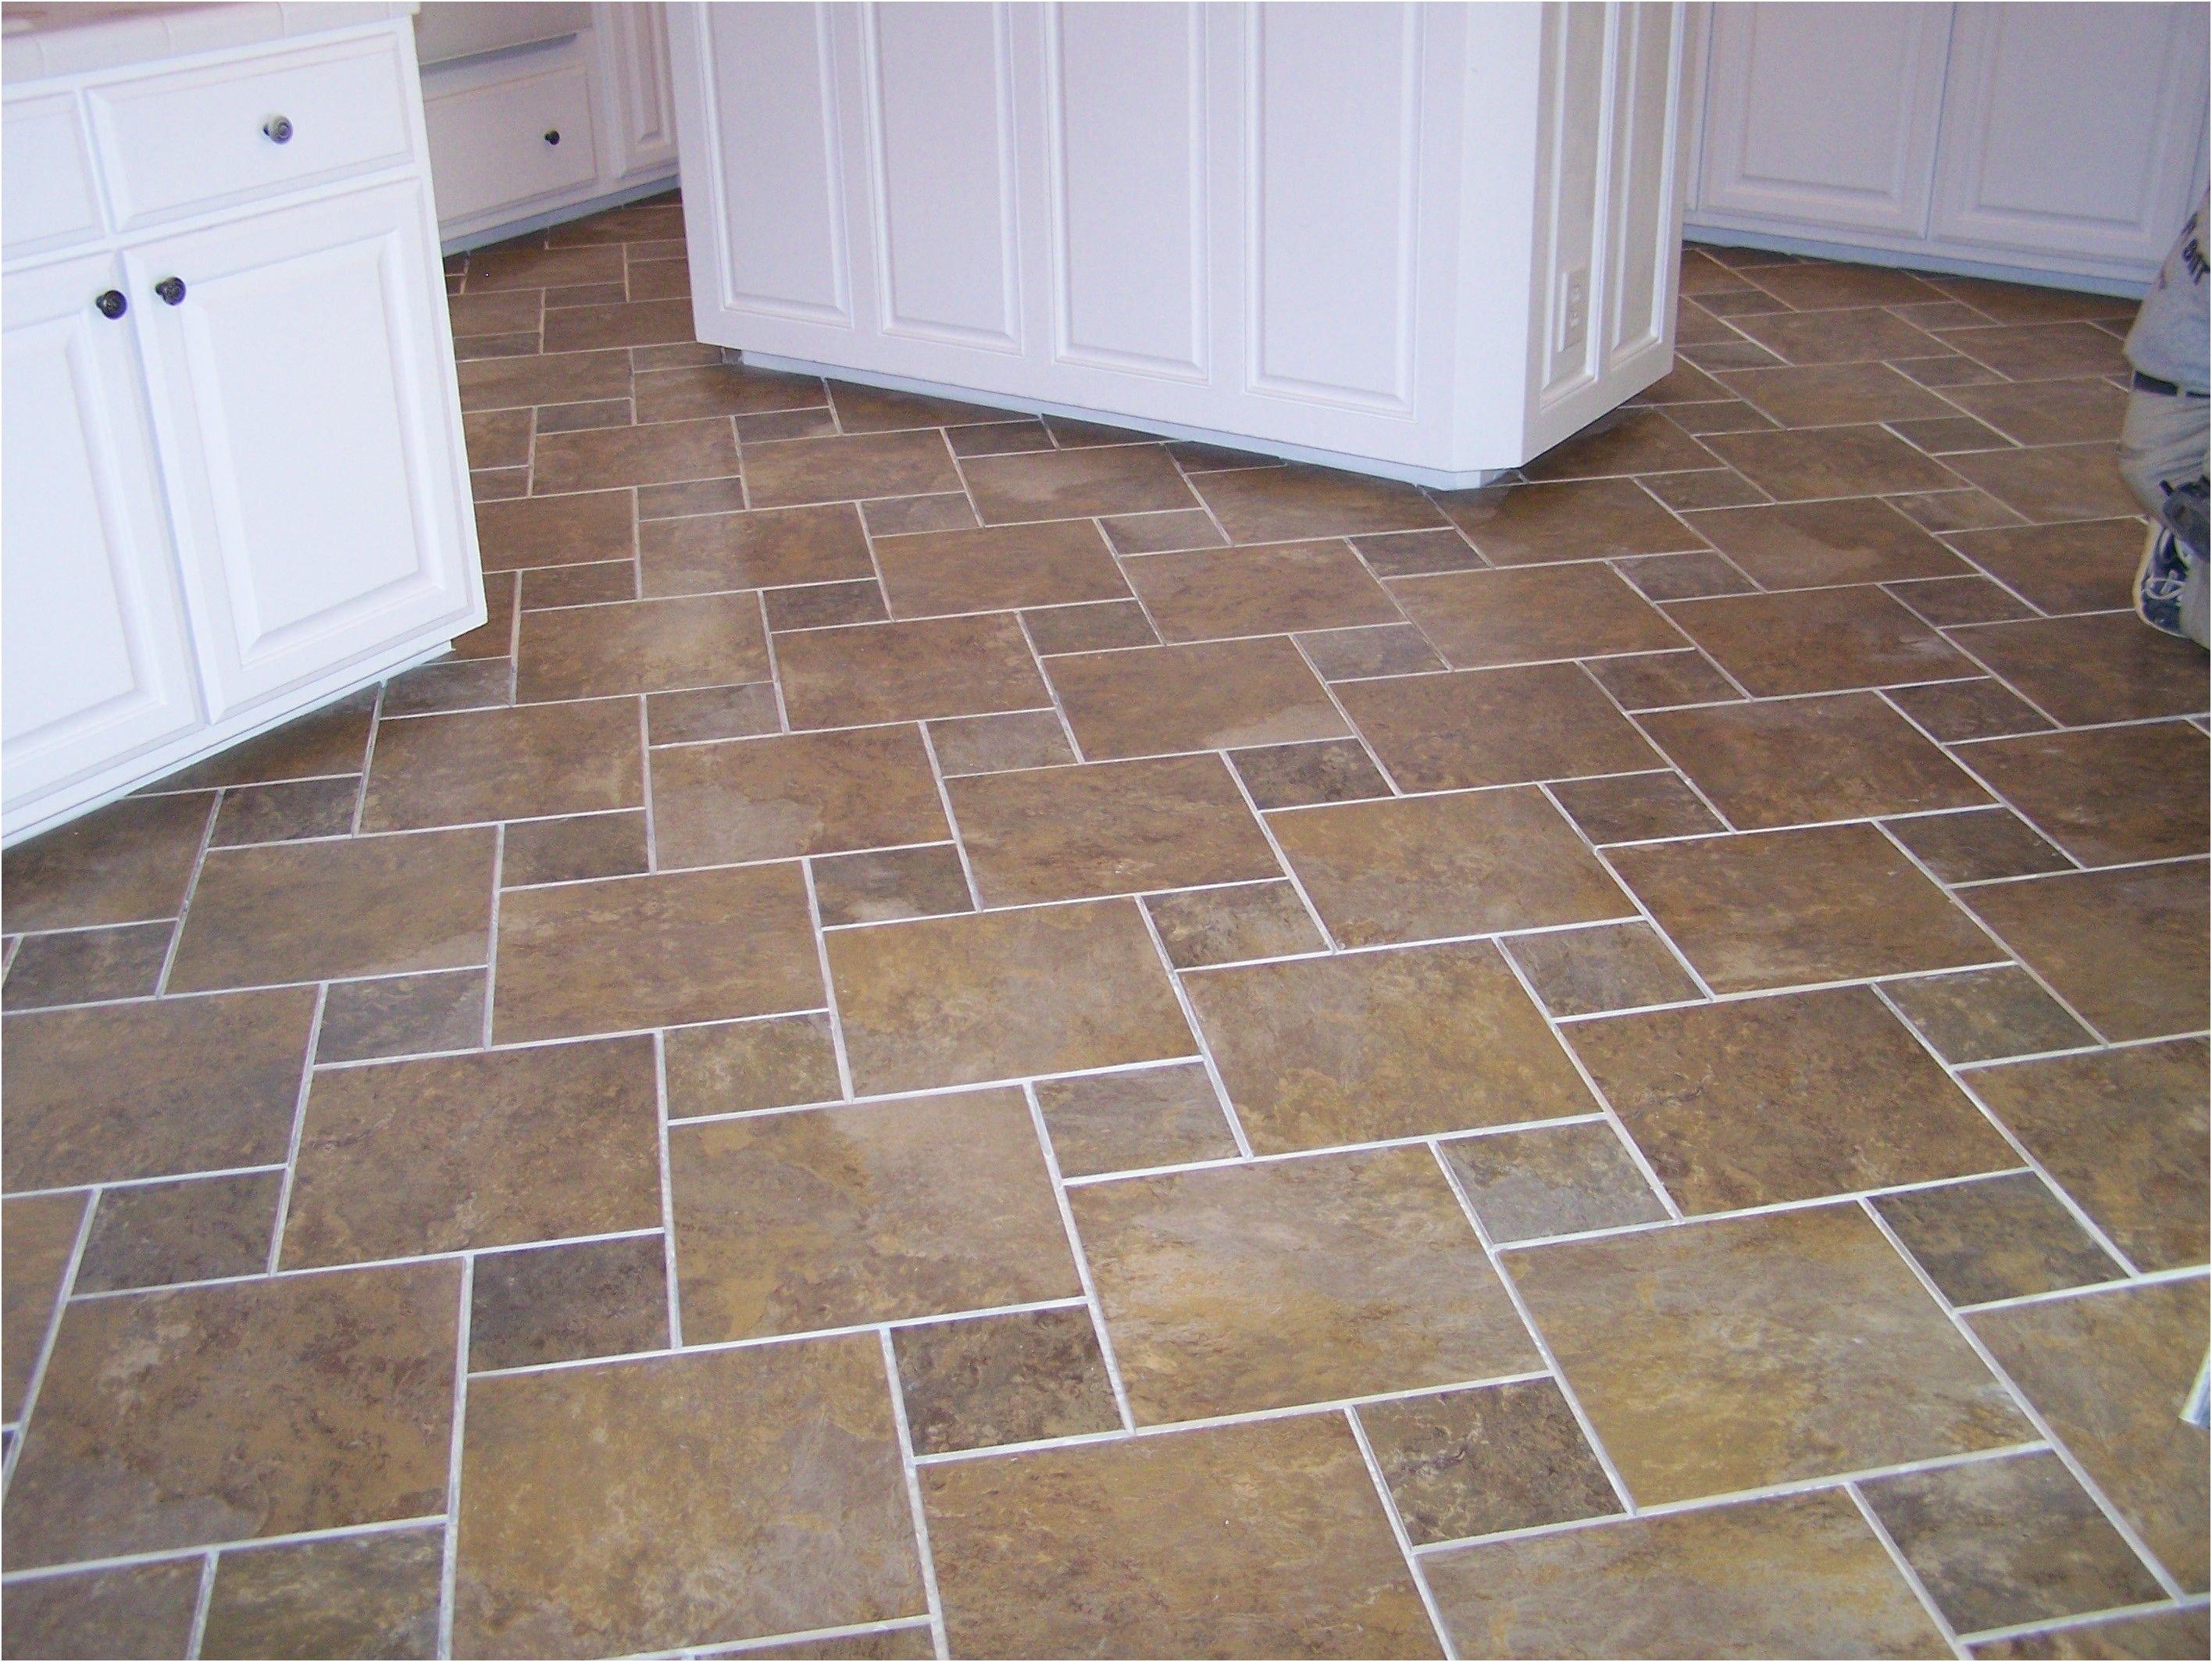 Extraordinary rubber floor tiles for bathrooms restaurant kitchen extraordinary rubber floor tiles for bathrooms restaurant kitchen from non slip ceramic floor tiles for bathroom doublecrazyfo Images